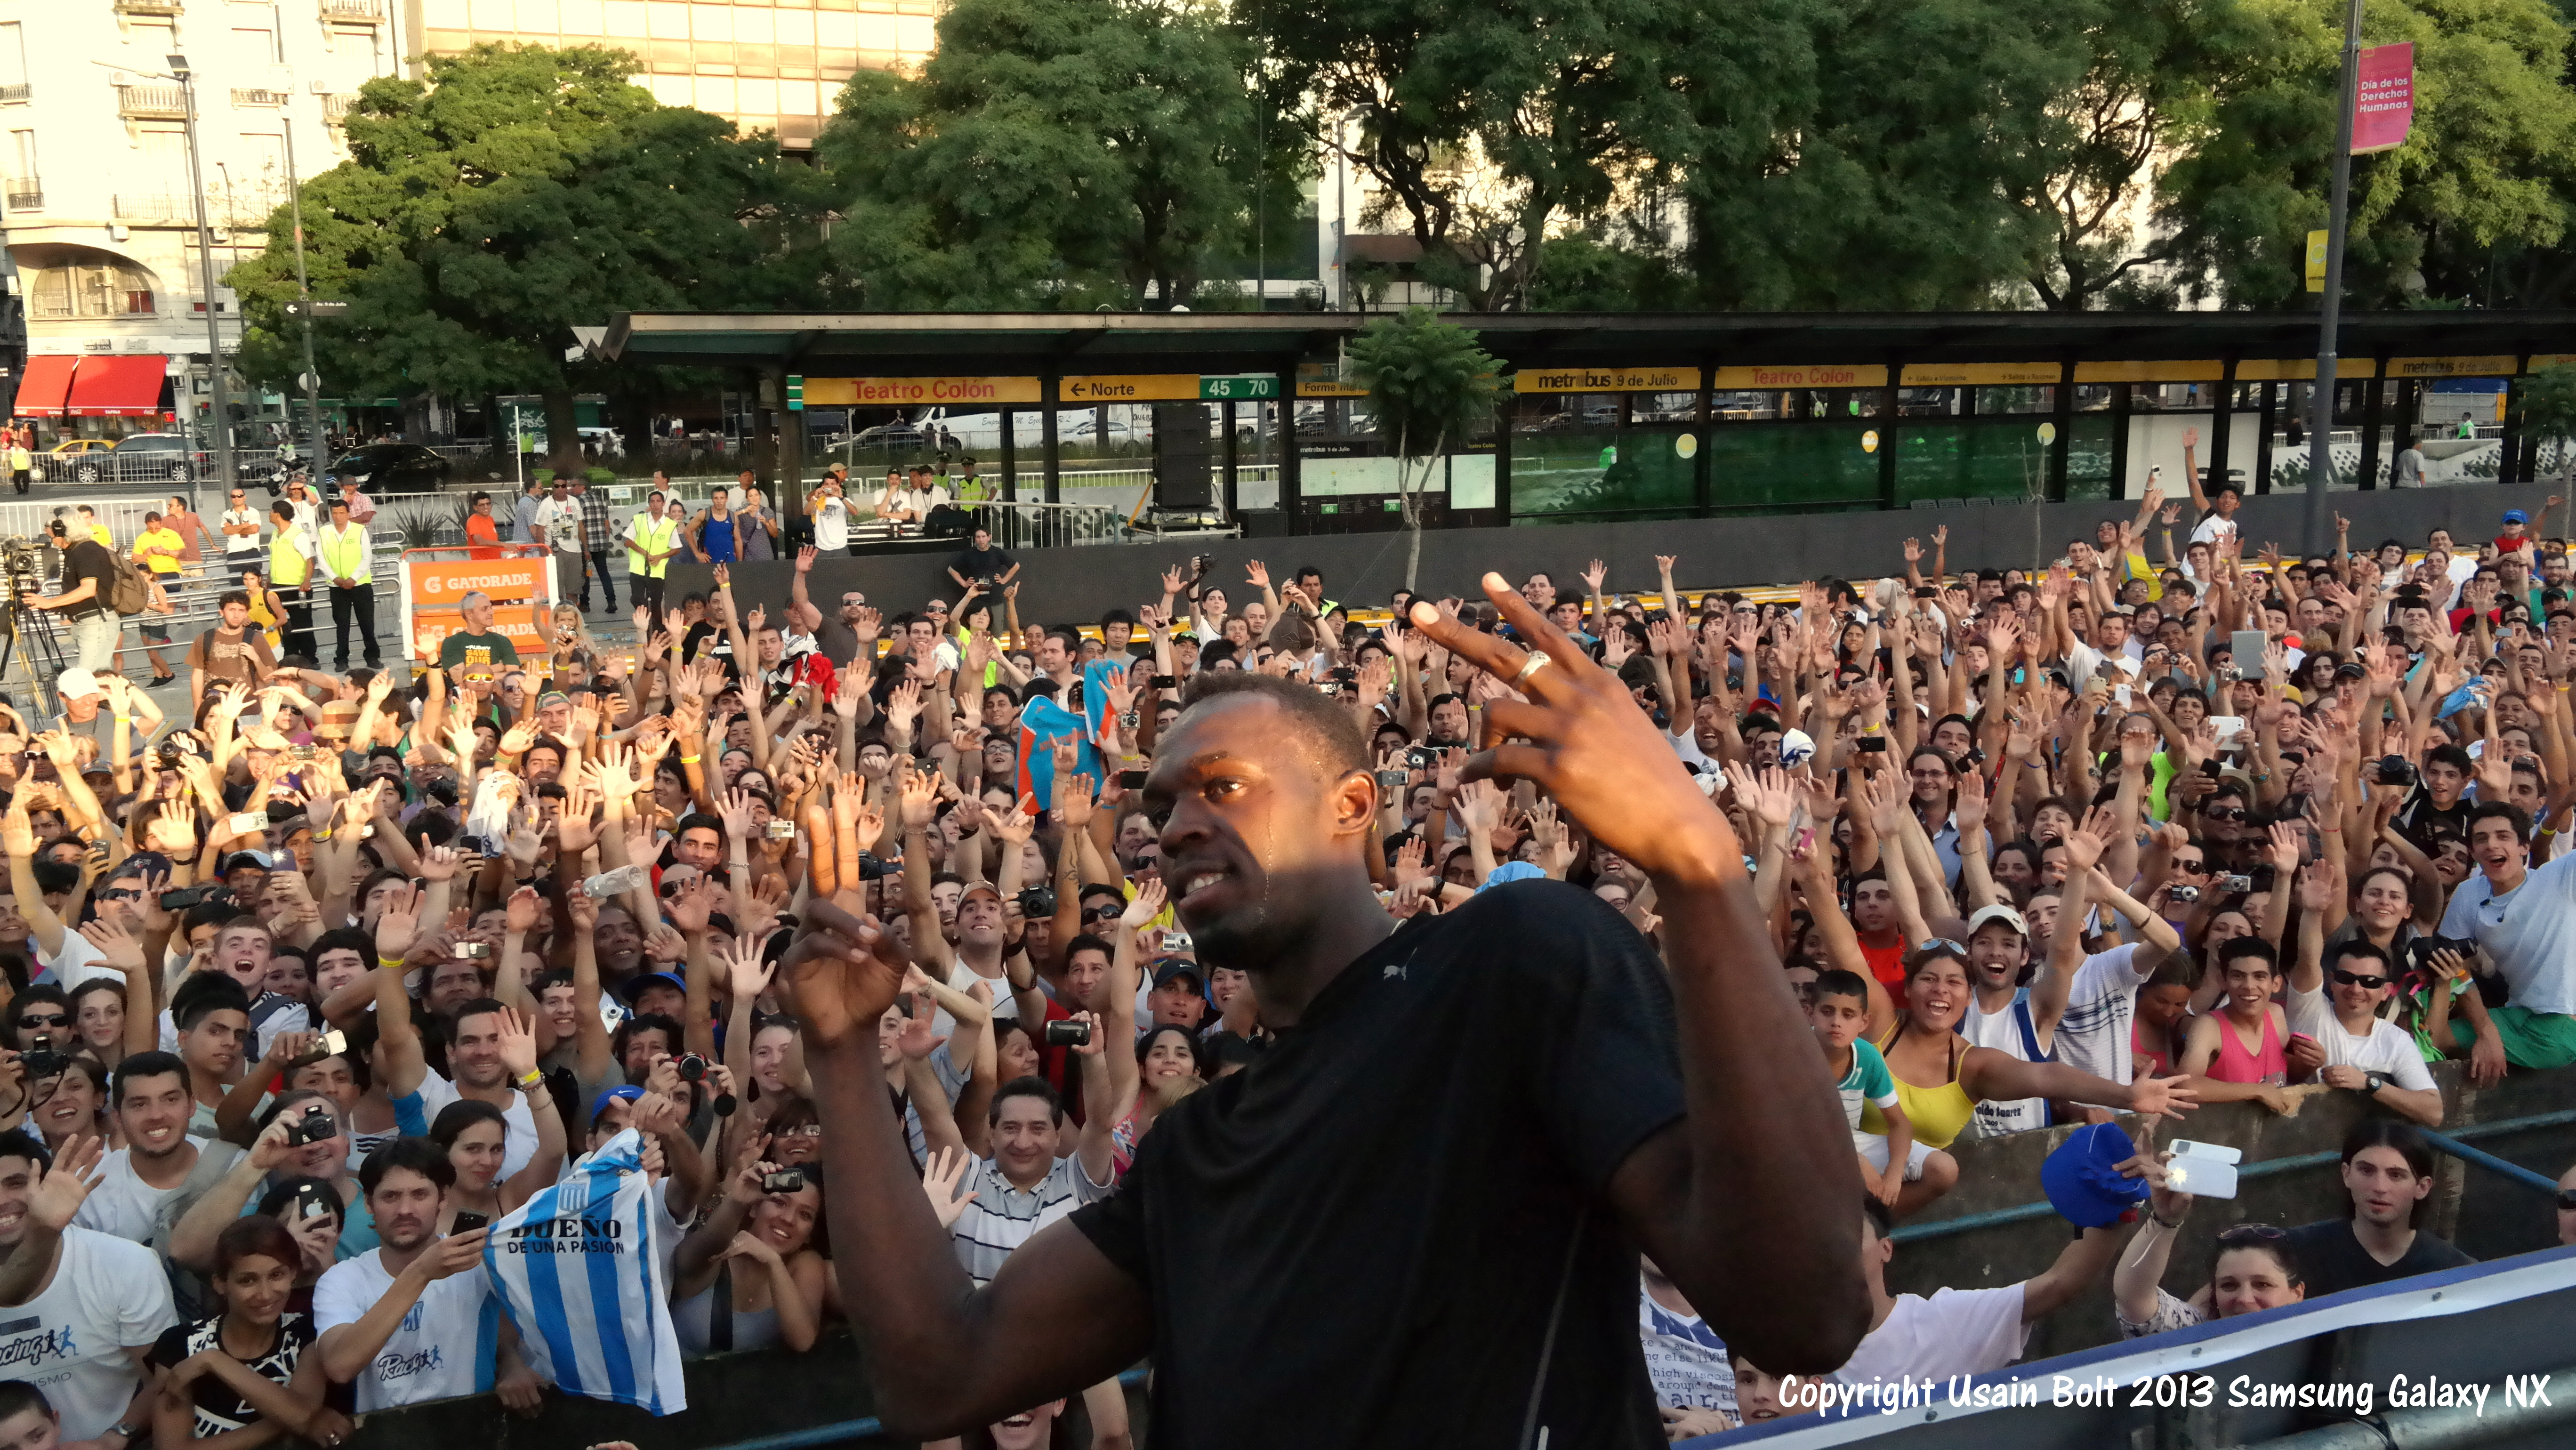 Usain in Argentina